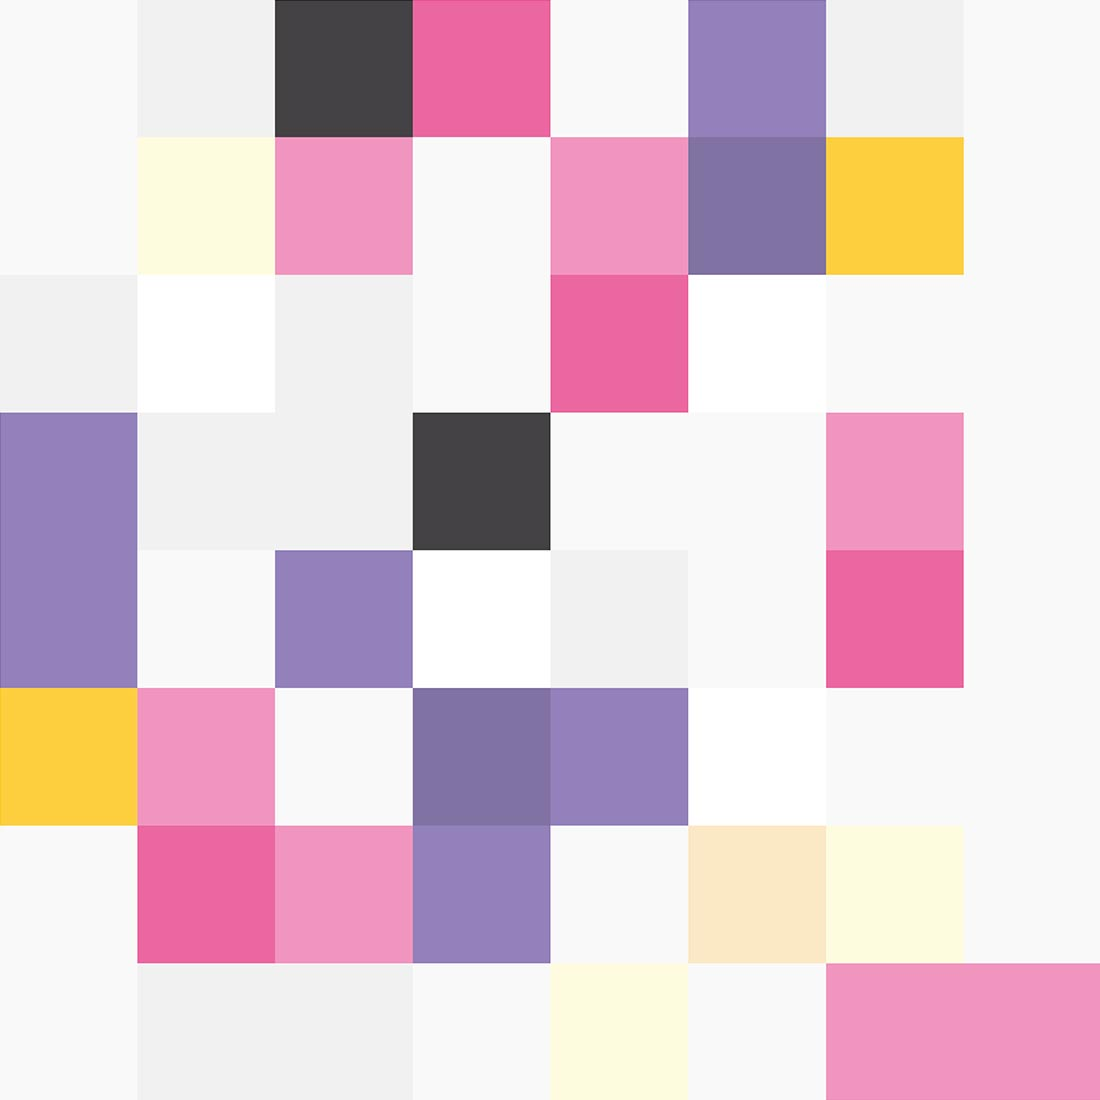 scrambled-videogame-charakters_02